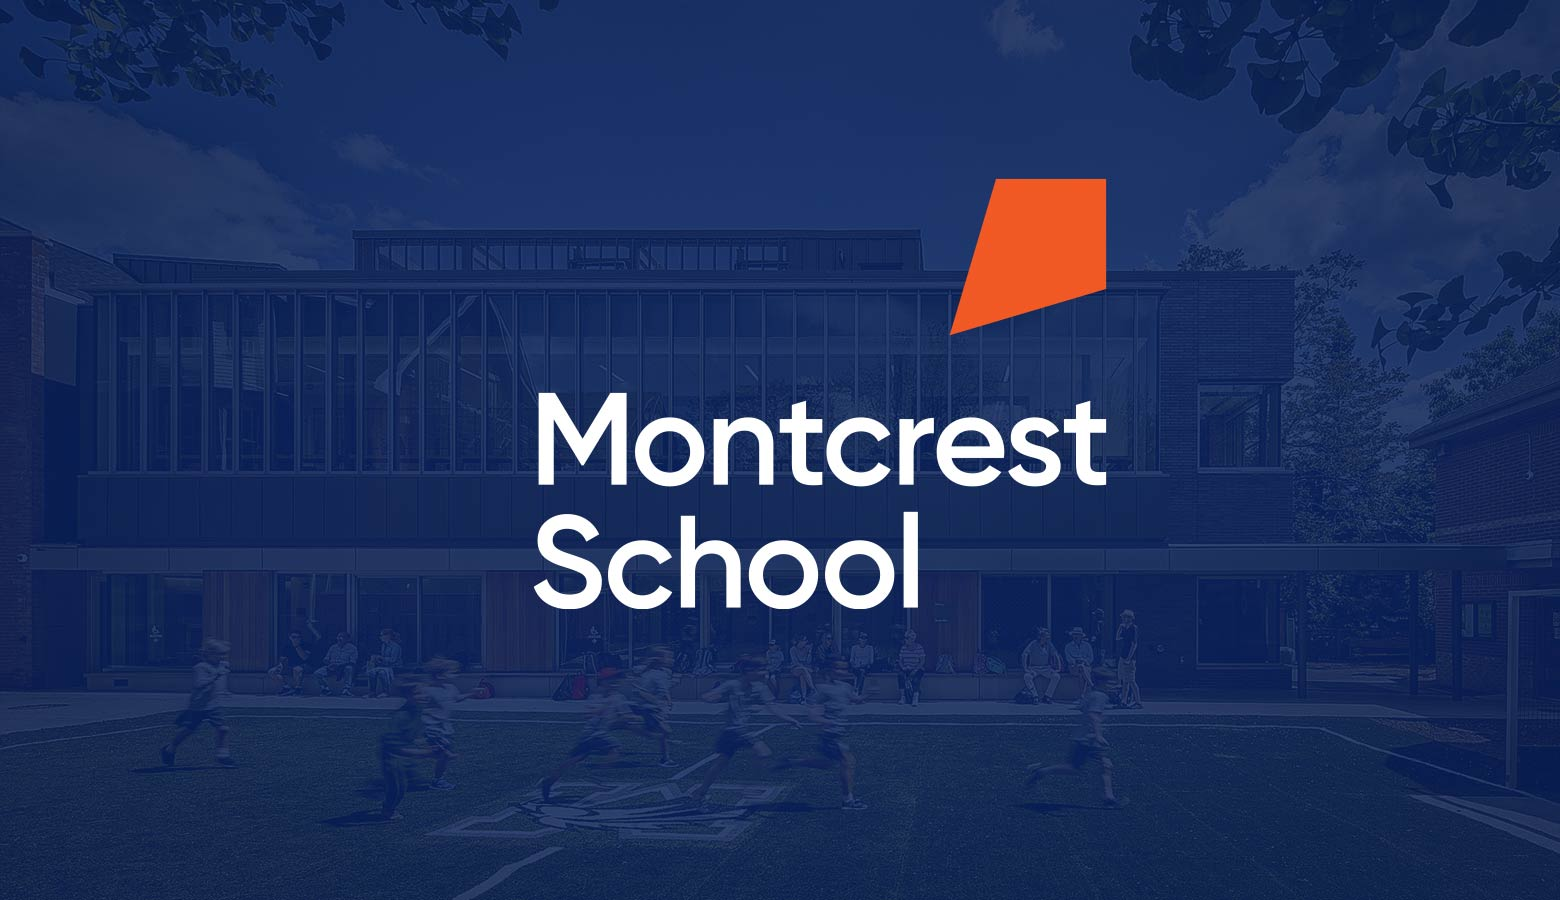 Montcrest